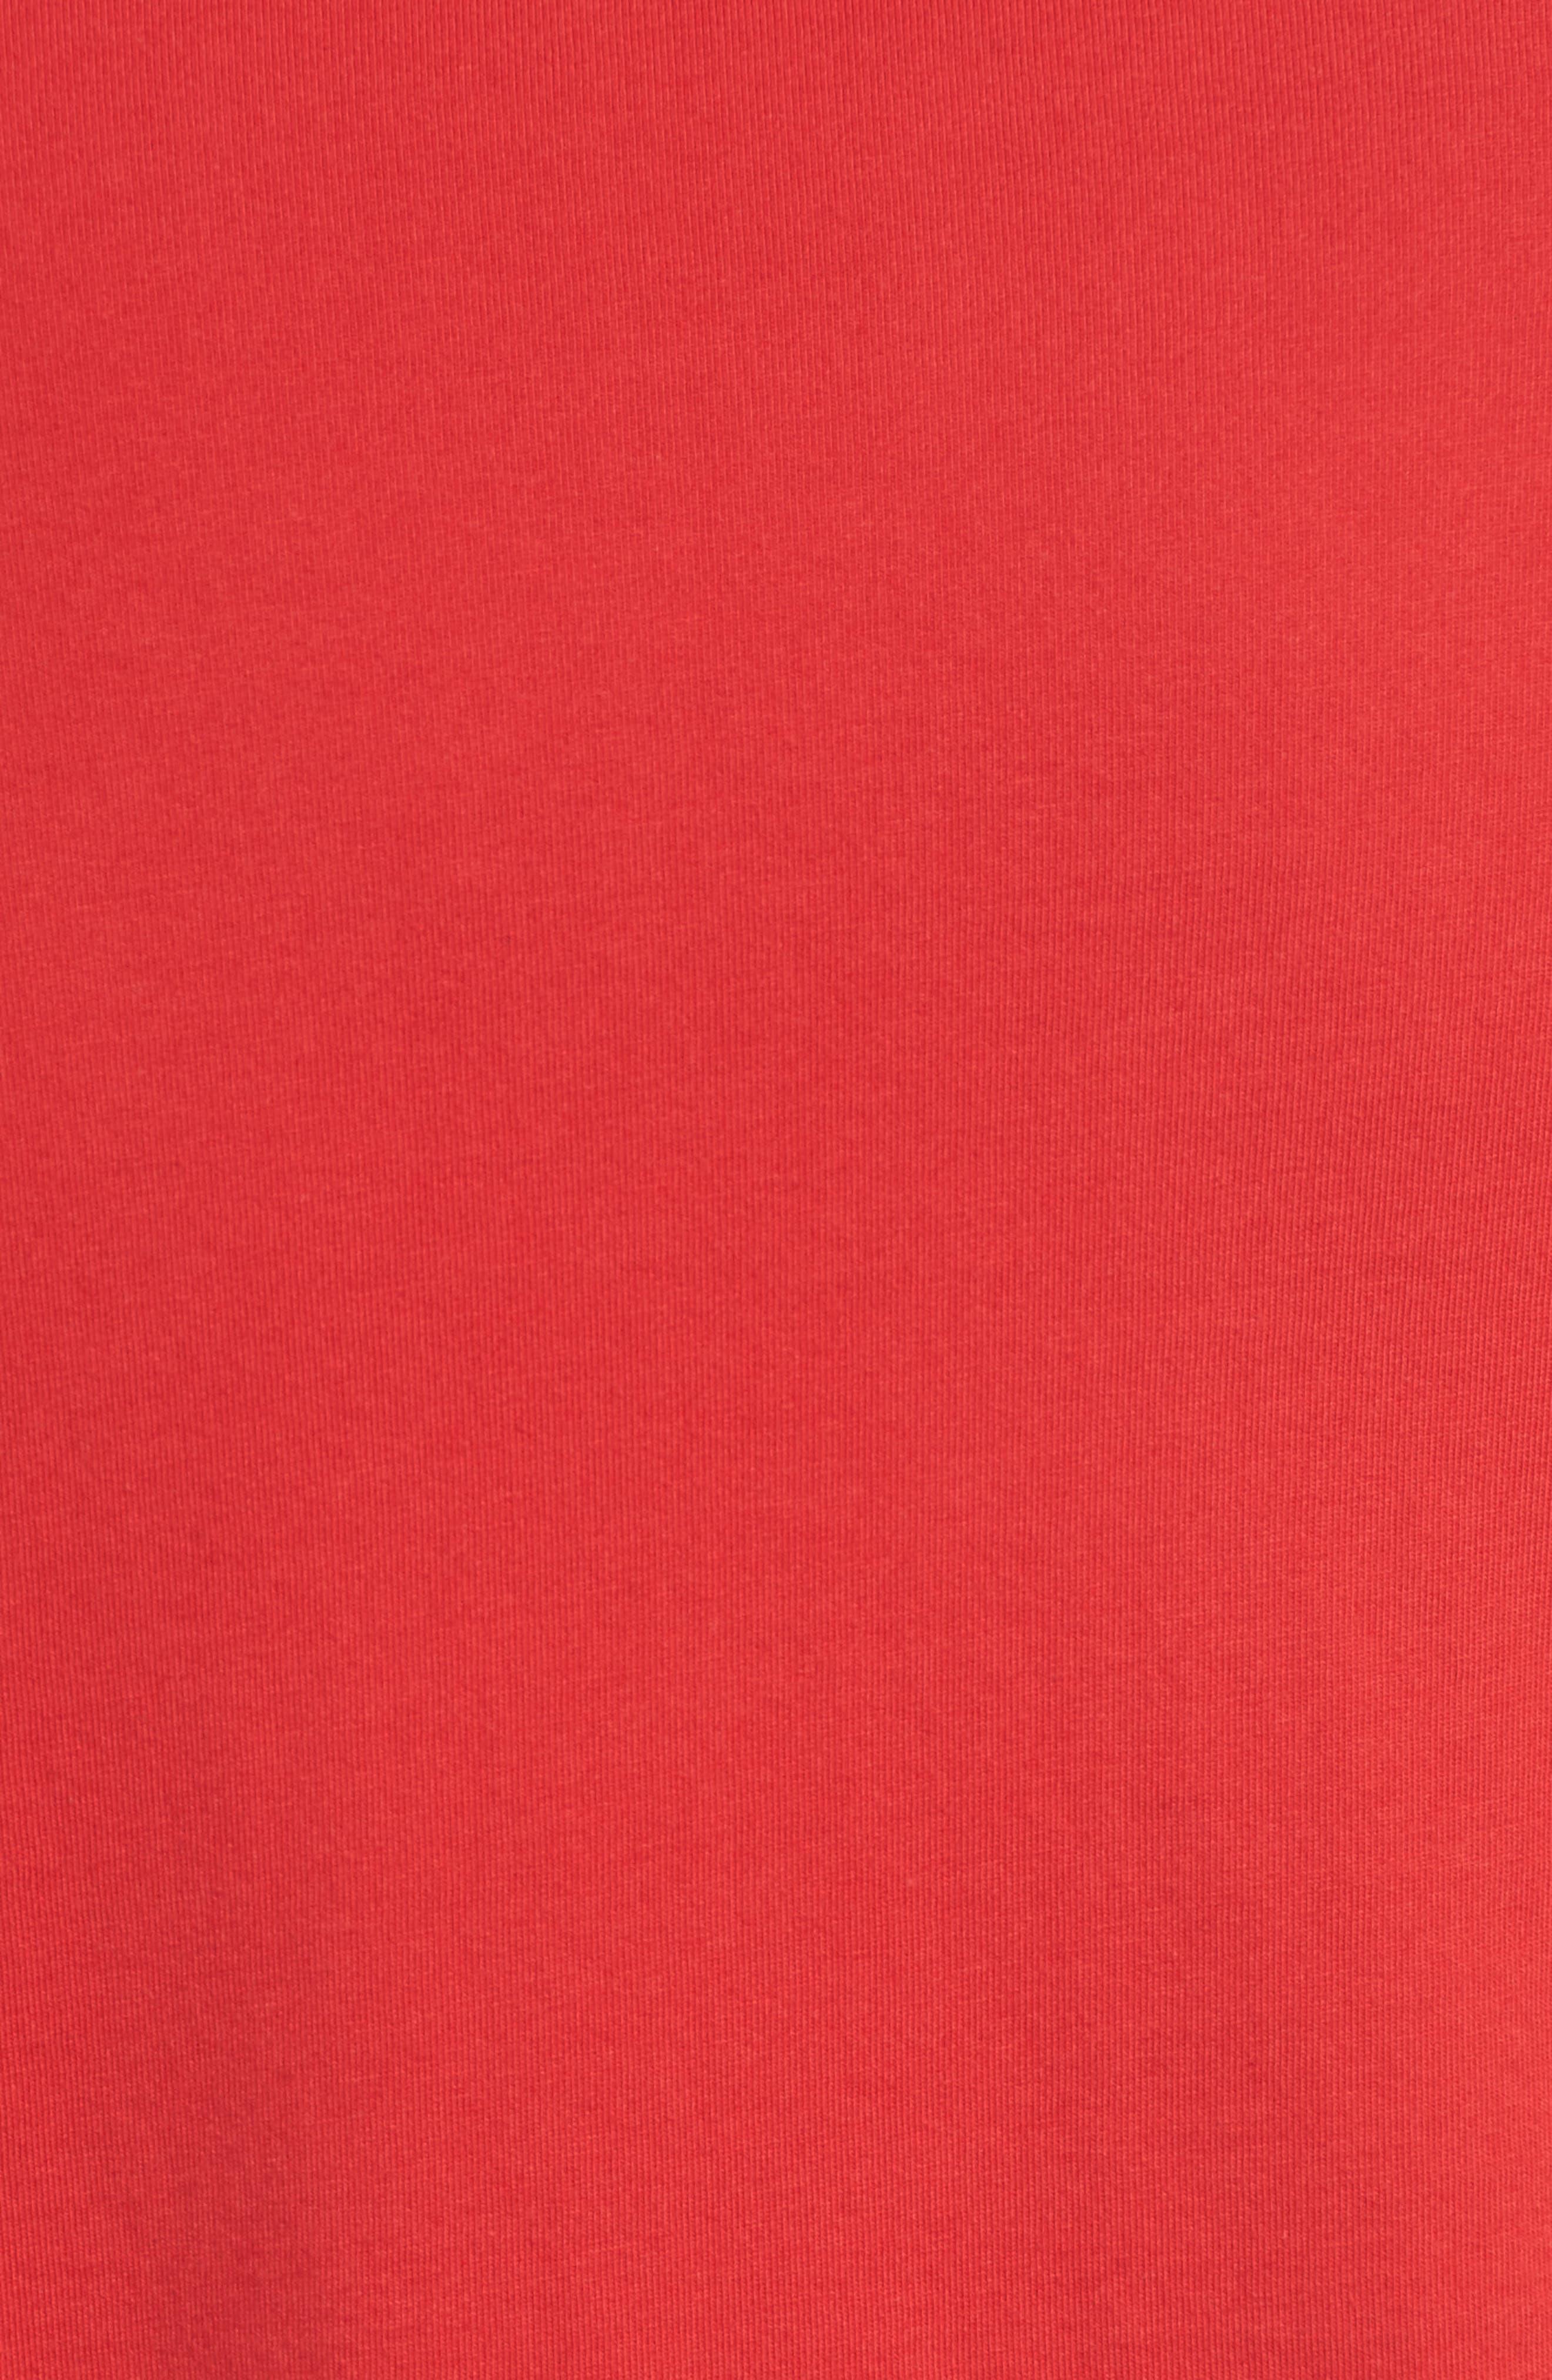 Bali Skyline T-Shirt,                             Alternate thumbnail 41, color,